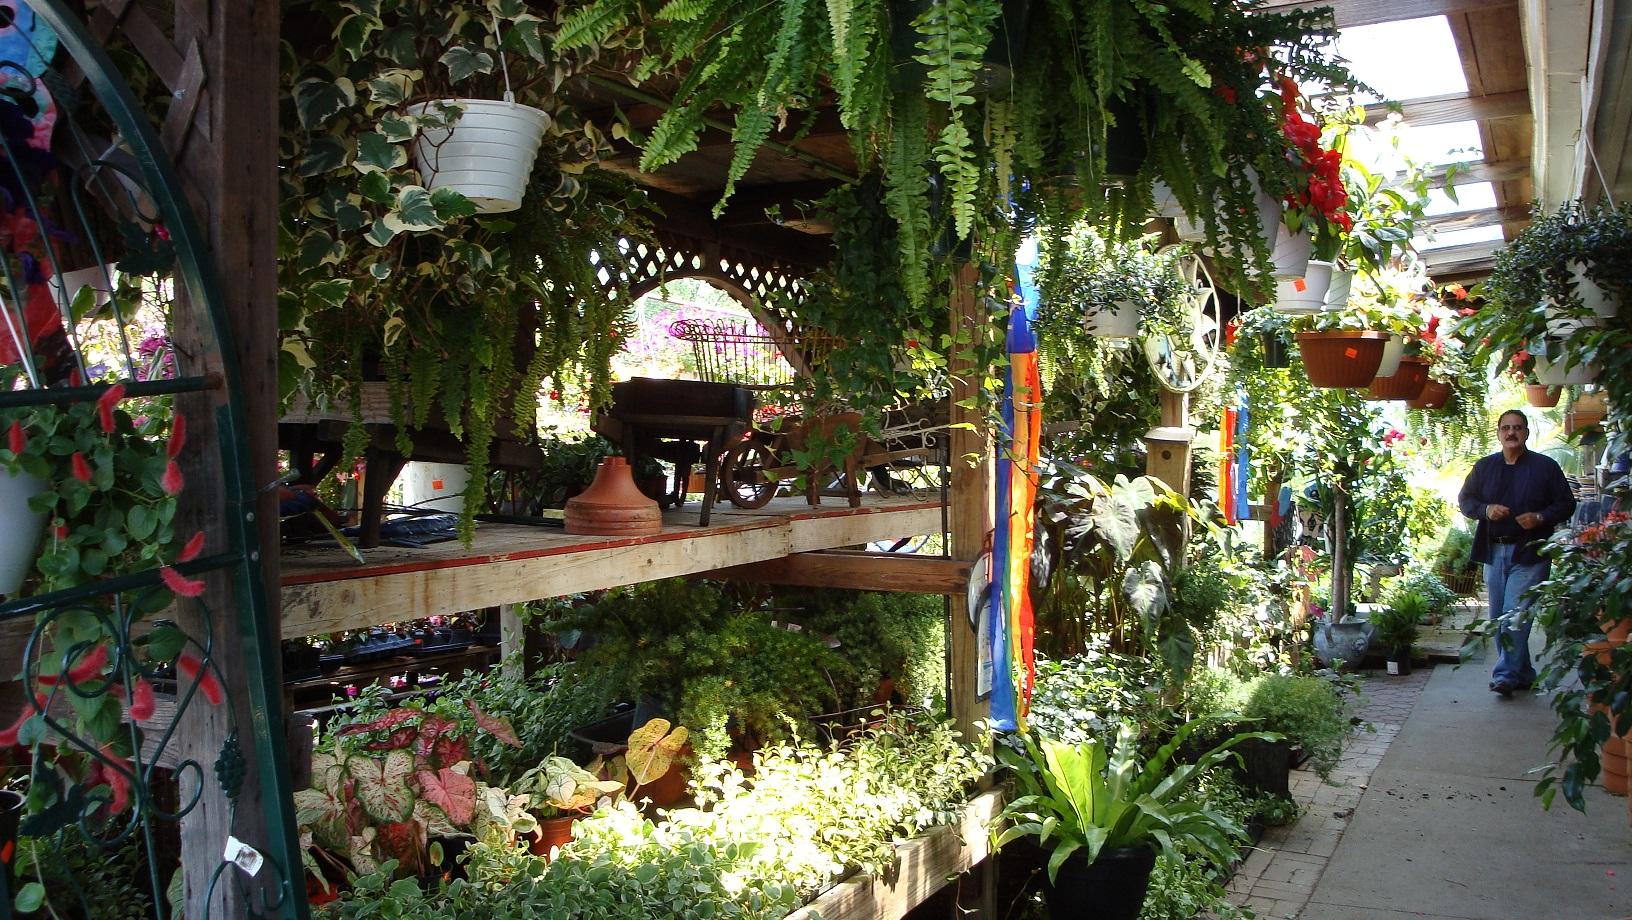 Tony Distefano Landscape Garden Center image 7